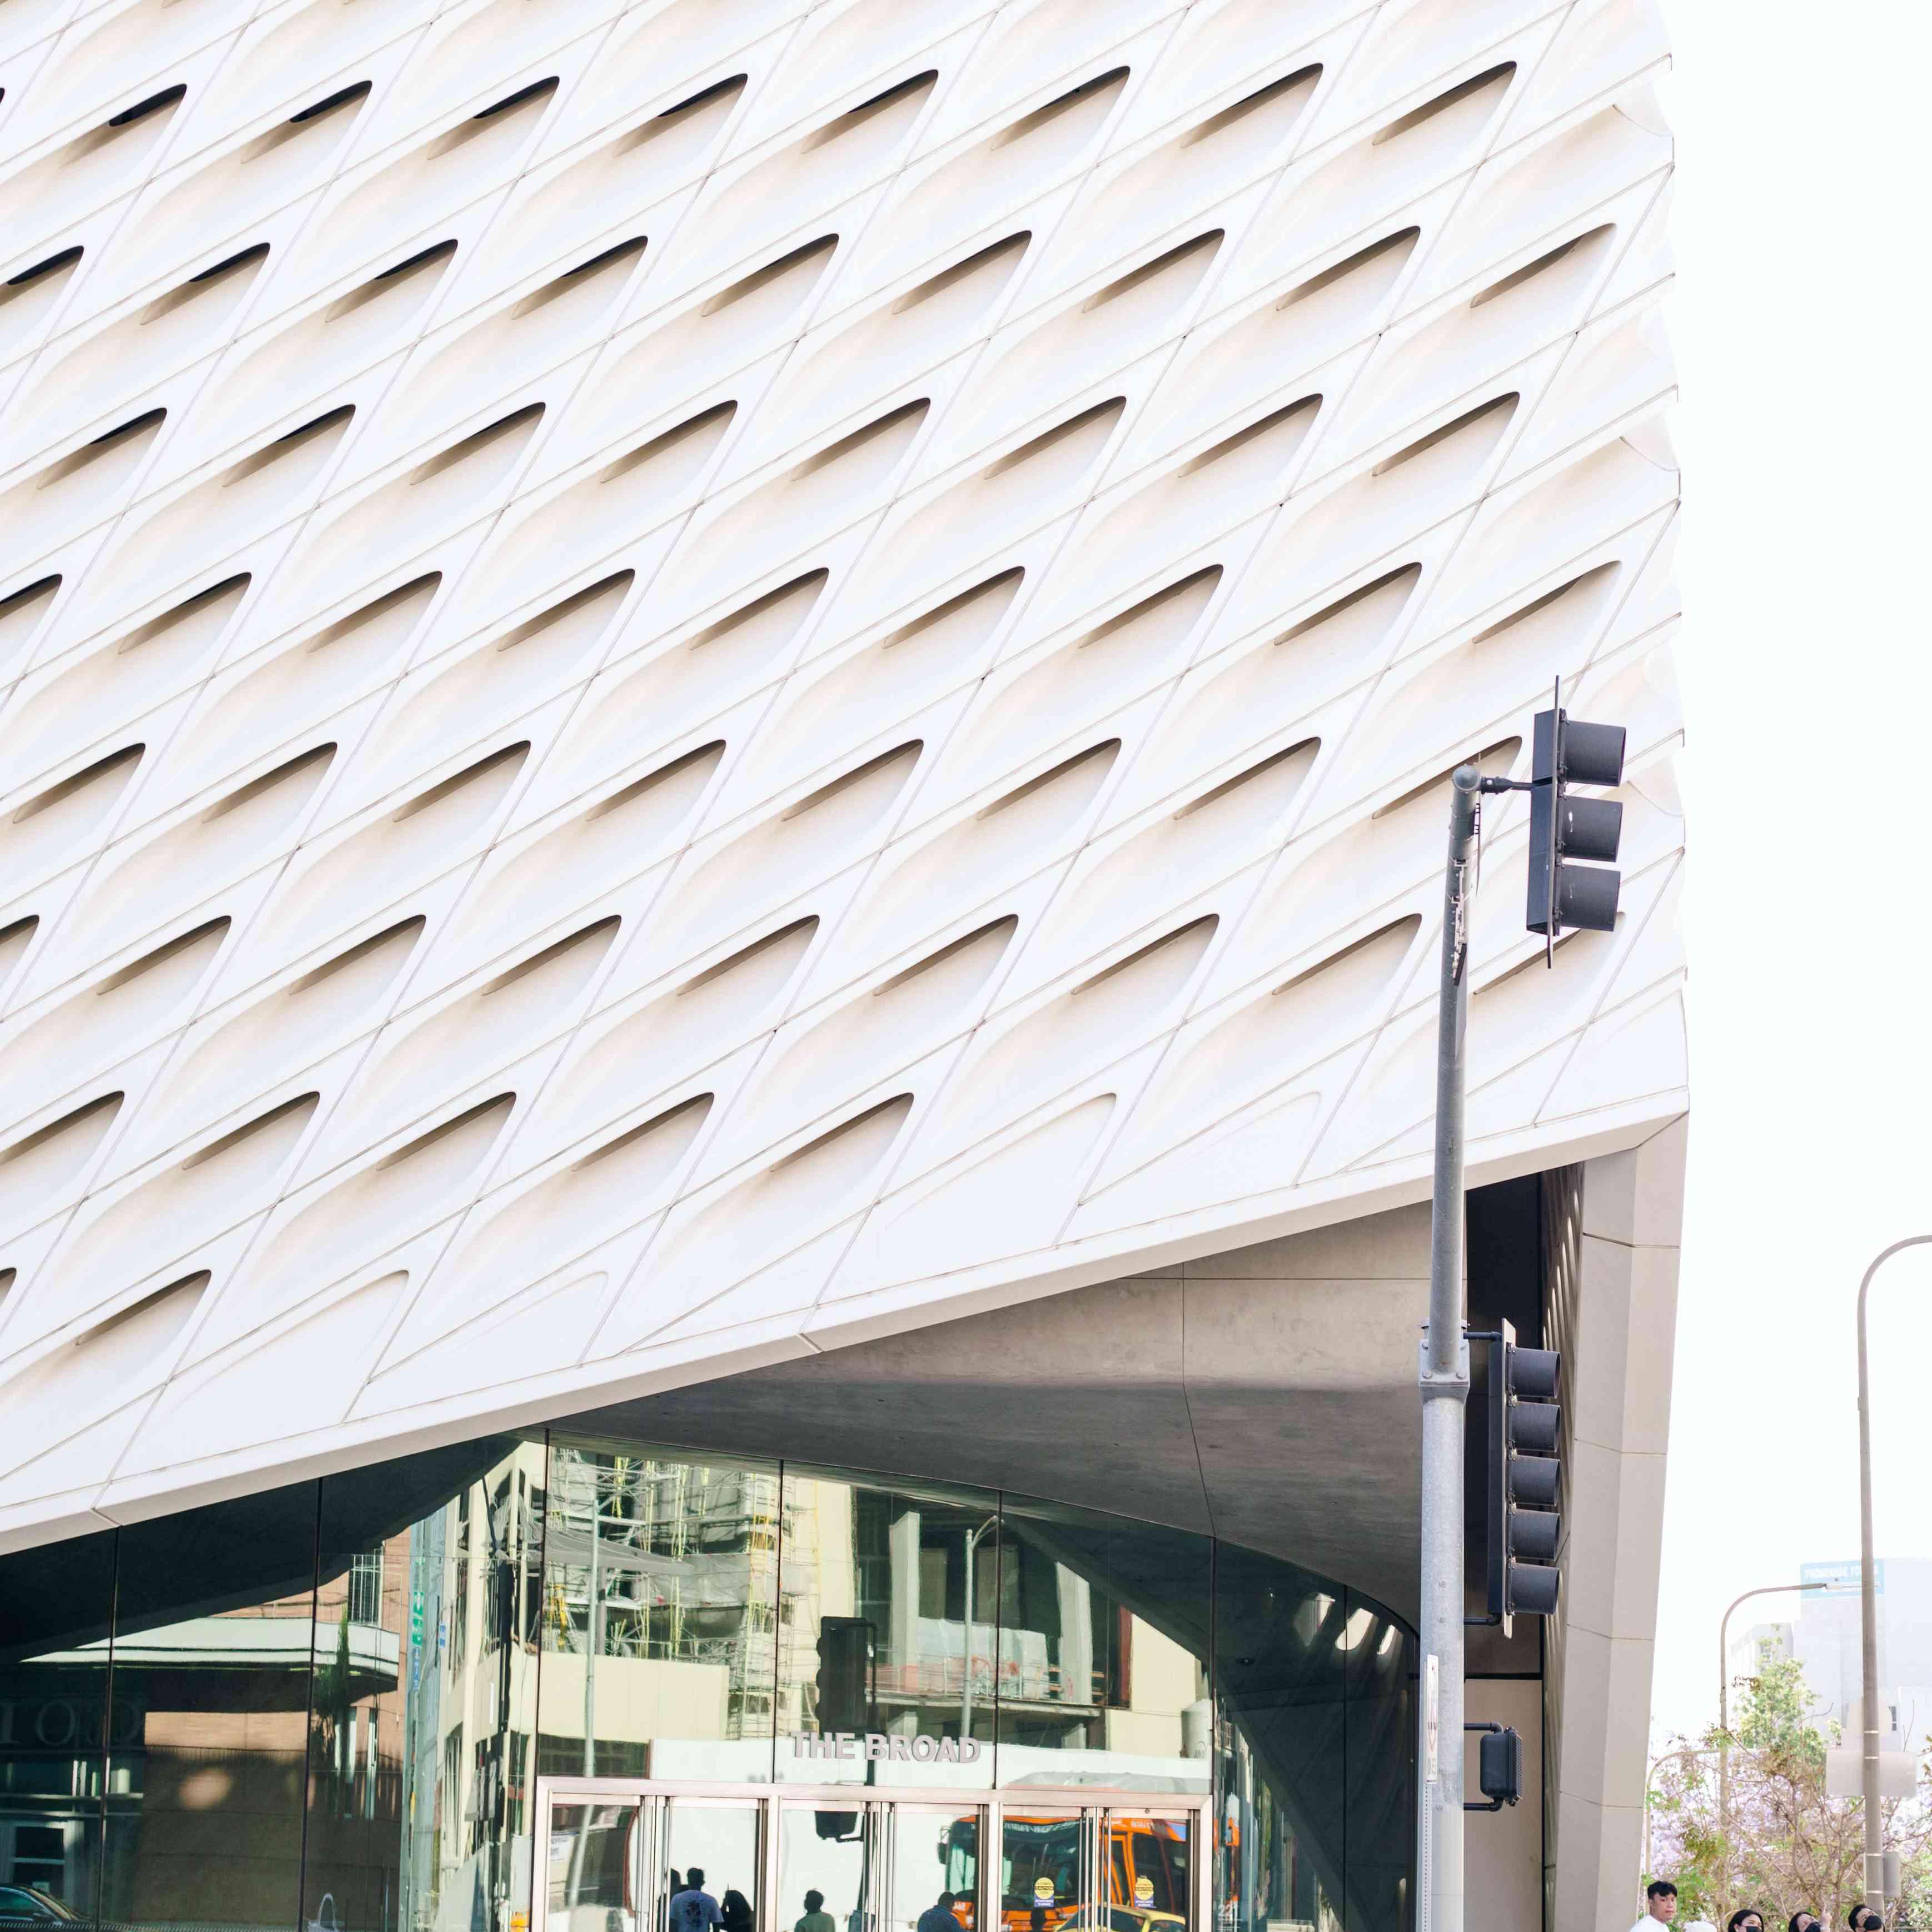 The Broad Museum in LA